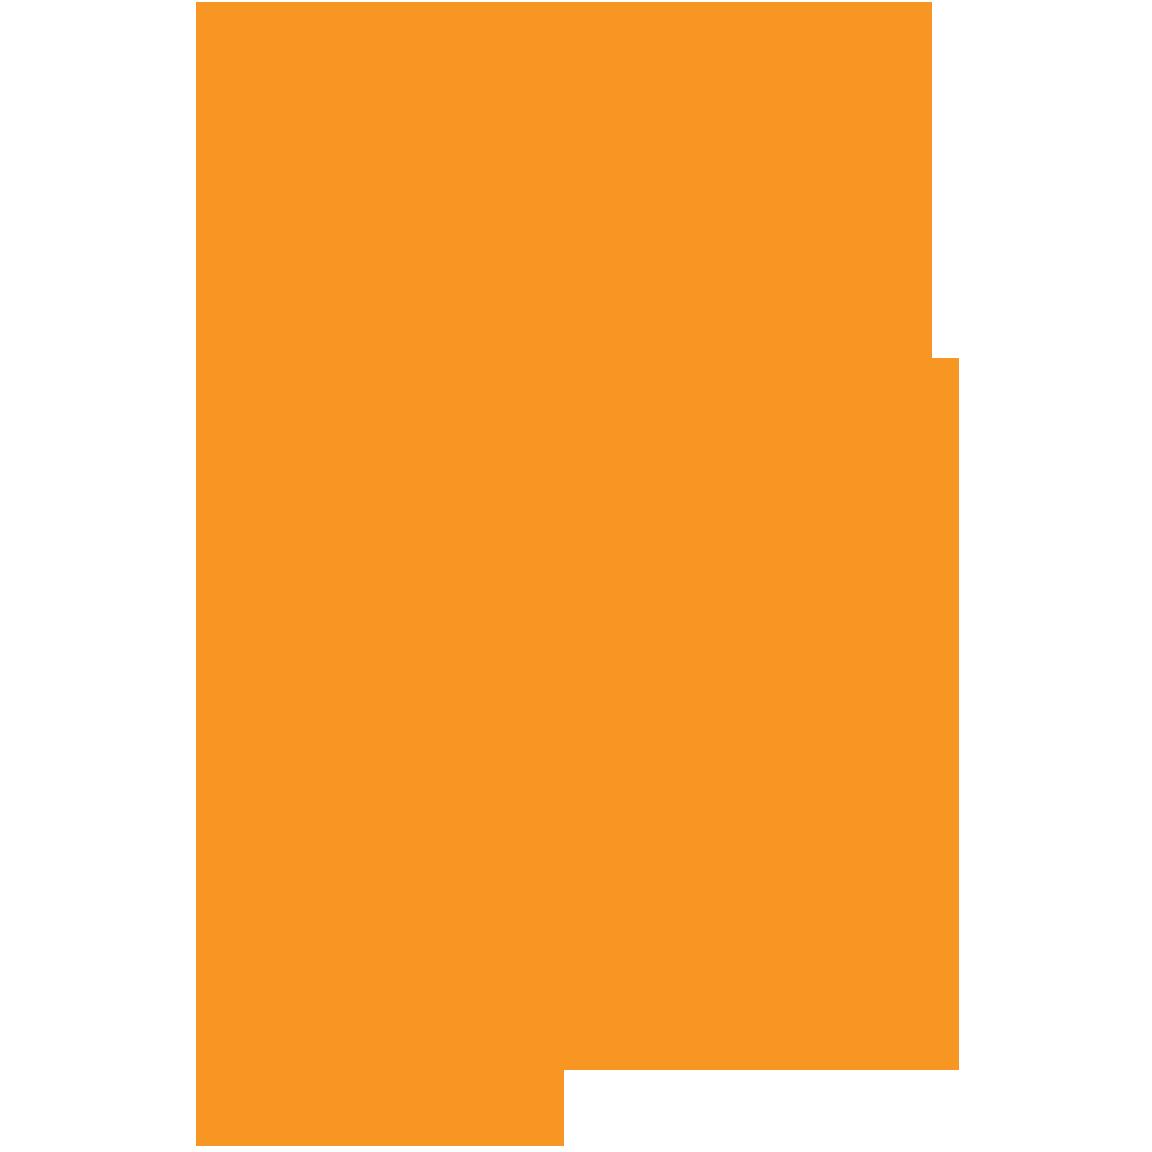 Galassia Studios